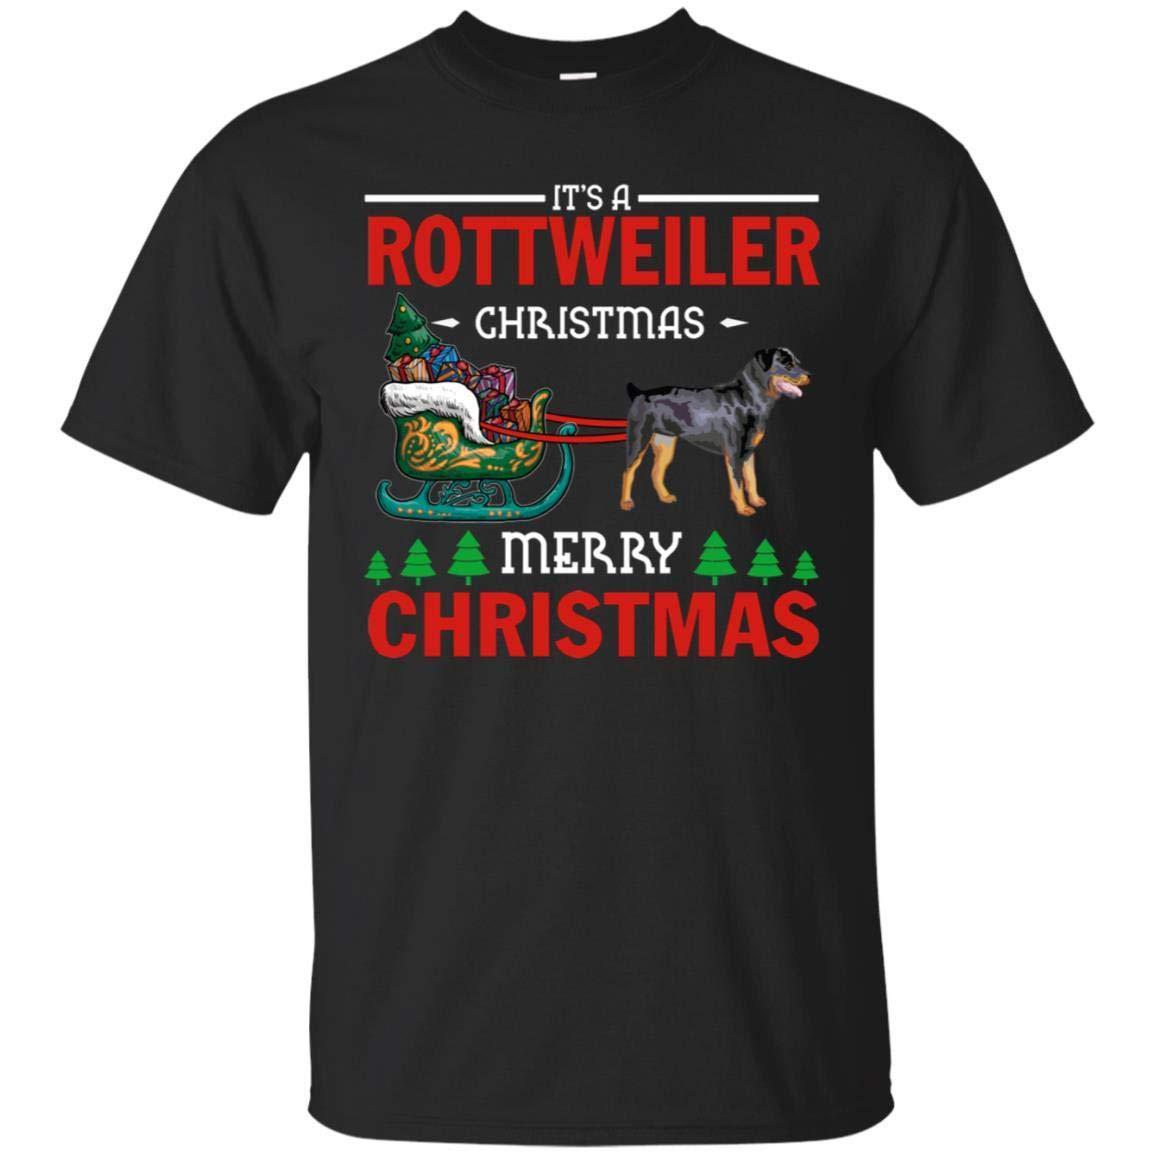 Merry Christmas Rottweiler Dog Lover Holiday Sweater Gift Shirt Unisex Tshirt 1912